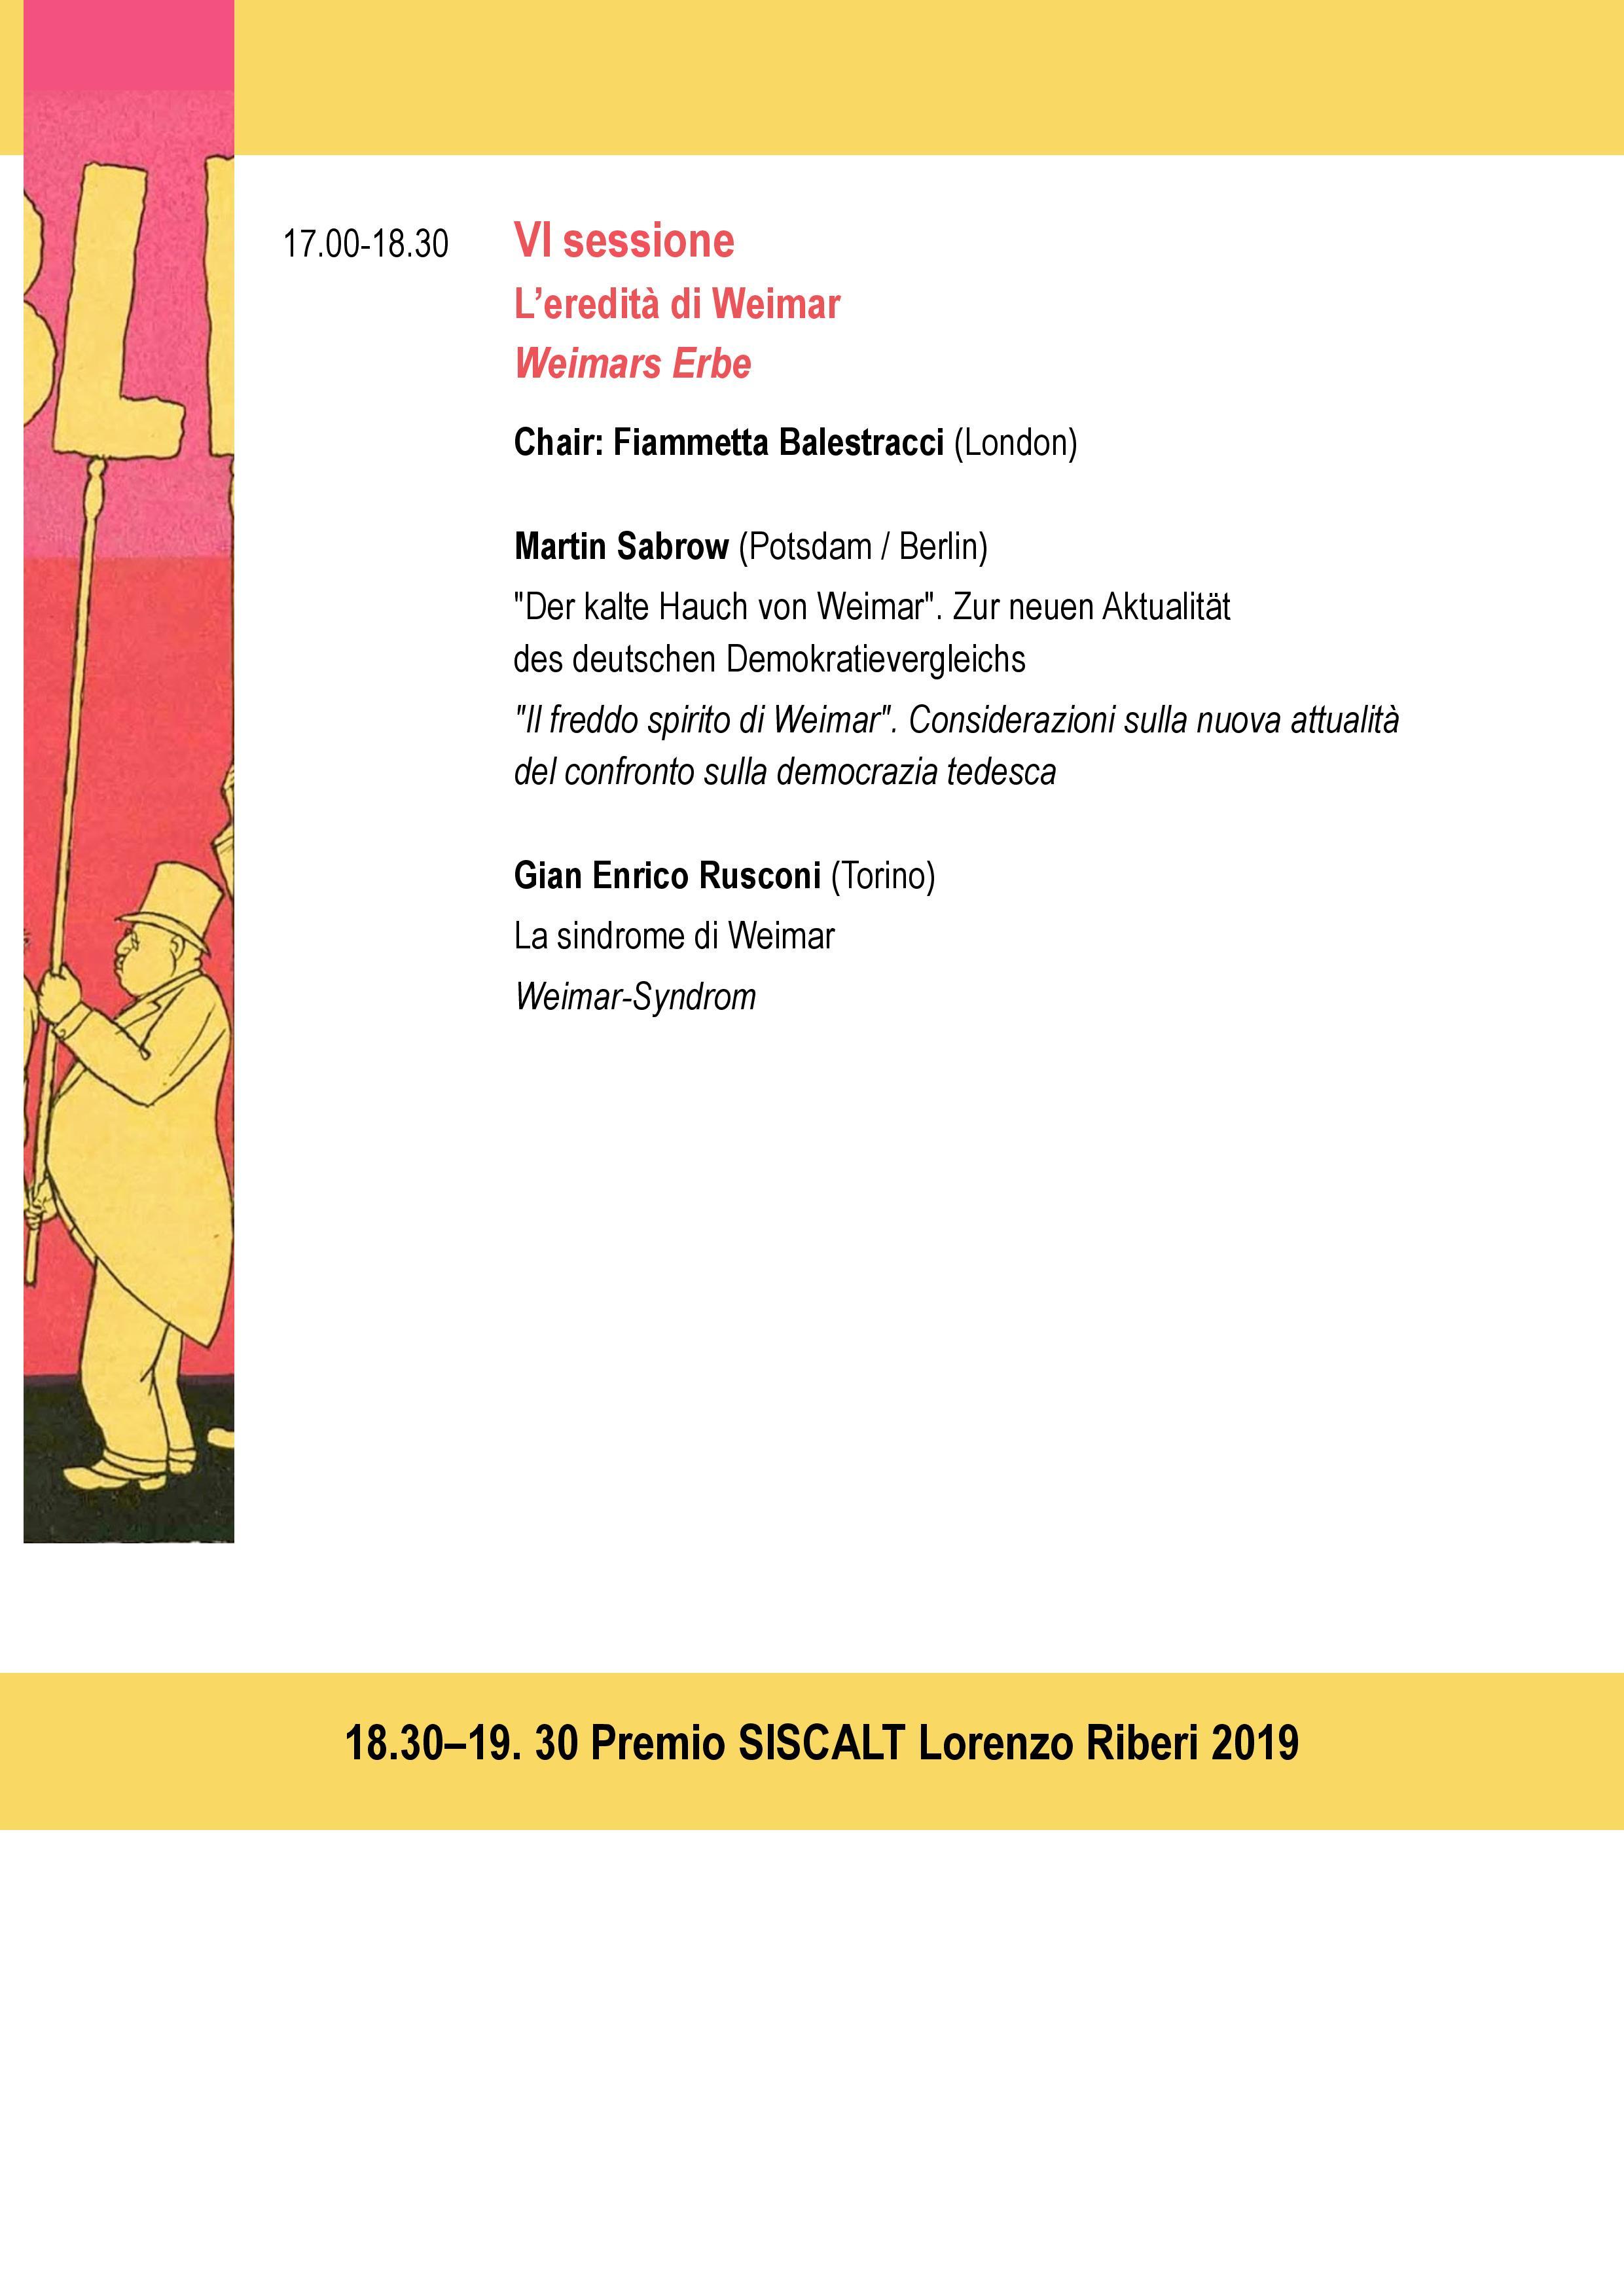 Programma SISCALT-page-009